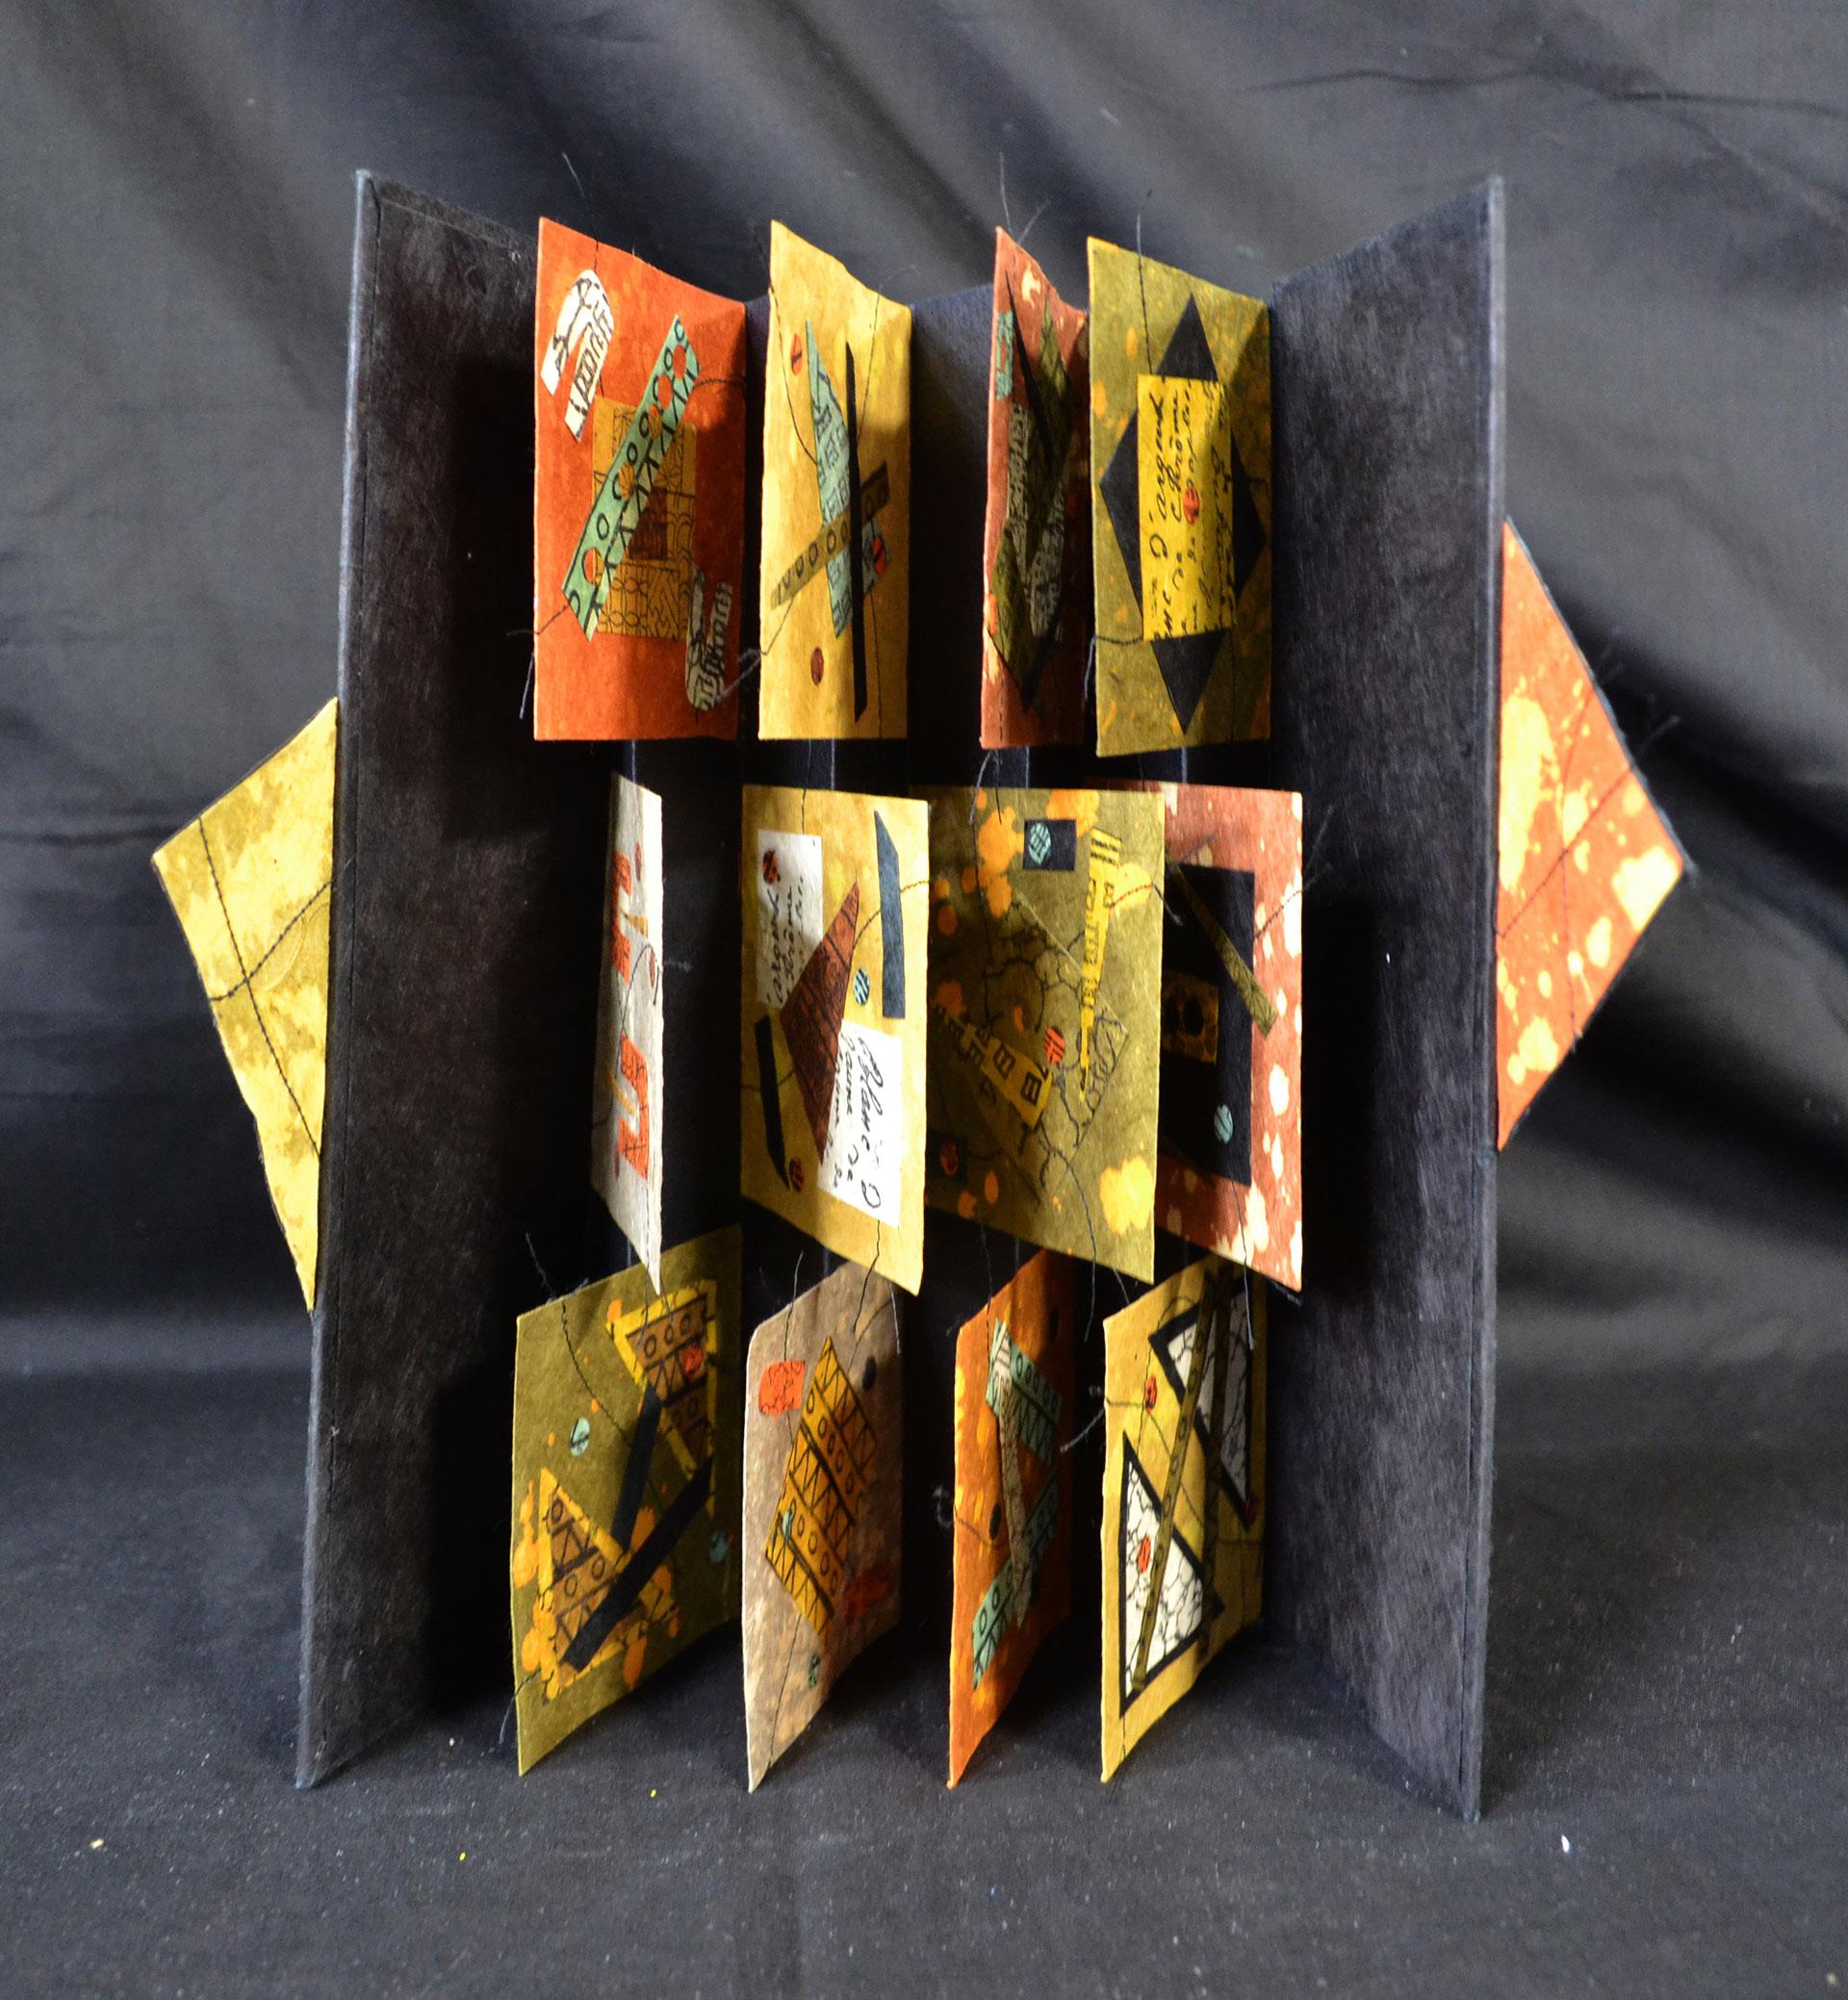 Barbara Buscolari, Patched Quilt, Paper-Book Arts, 2015